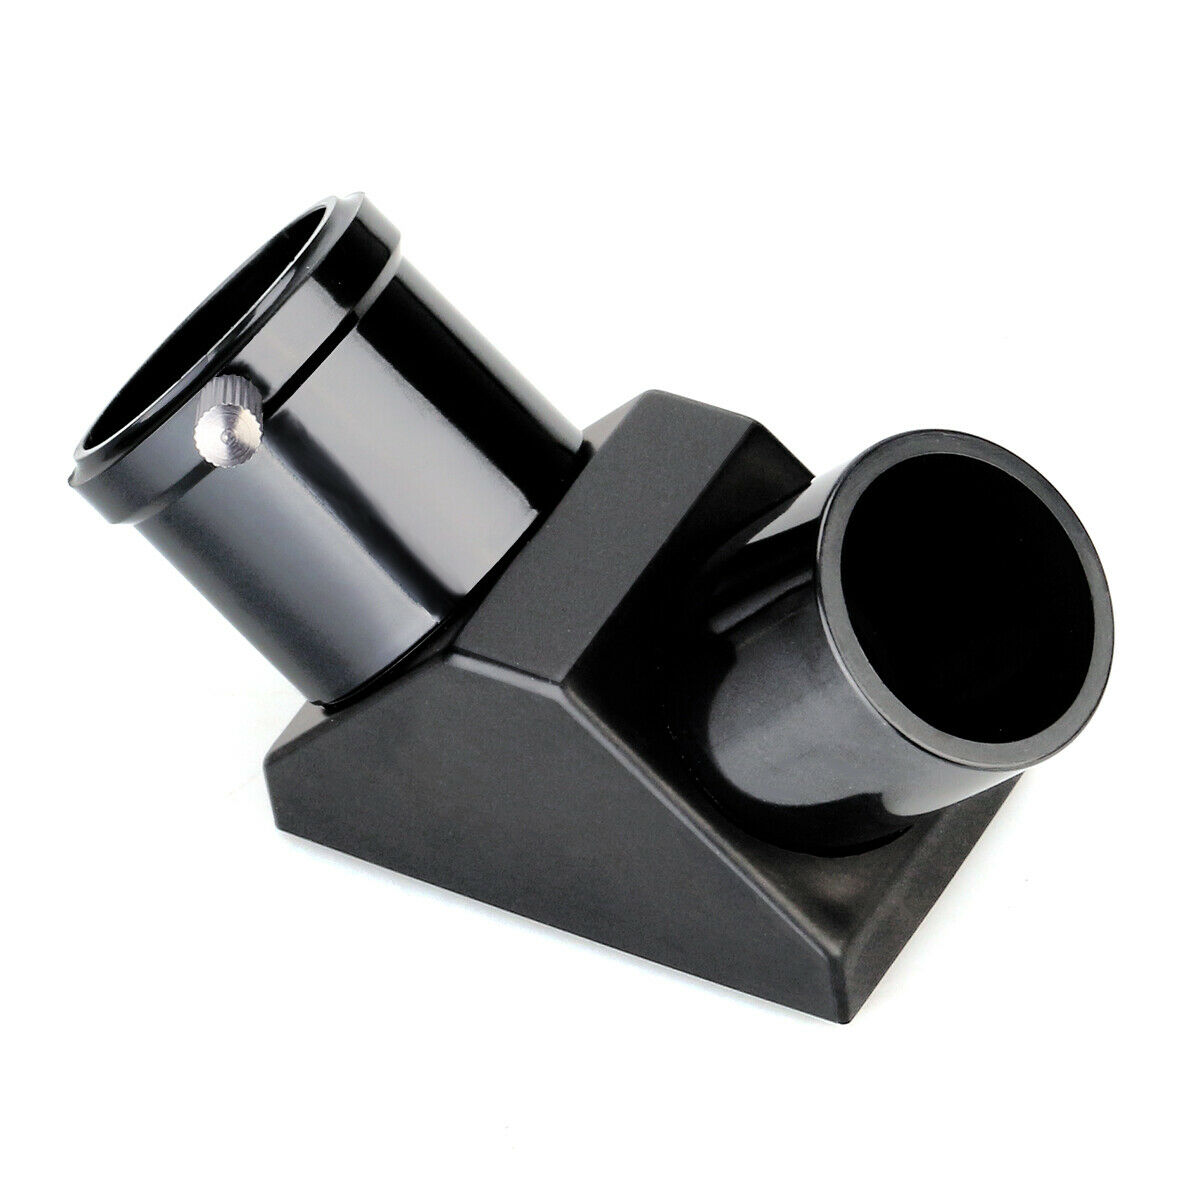 Espelho Diagonal 90° 1,25 Telescopio